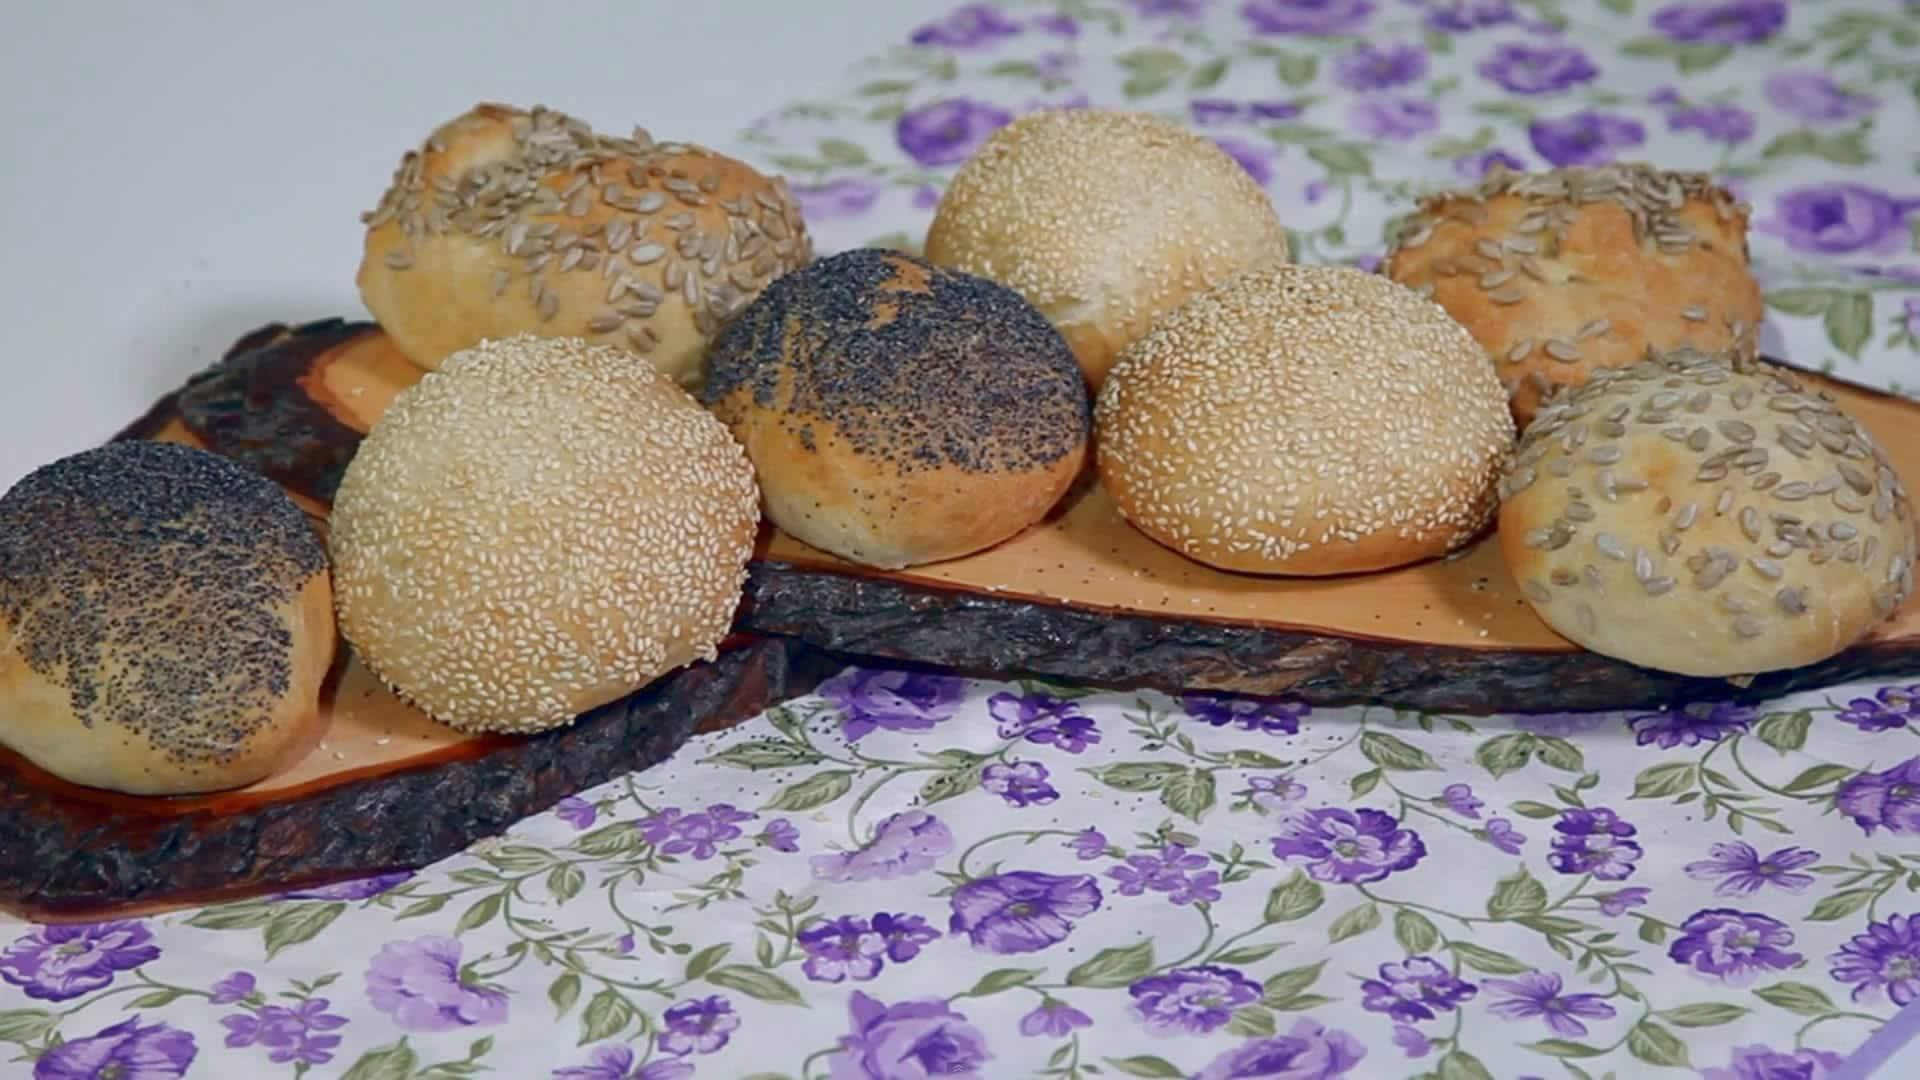 Foto Panini ricoperti di semi